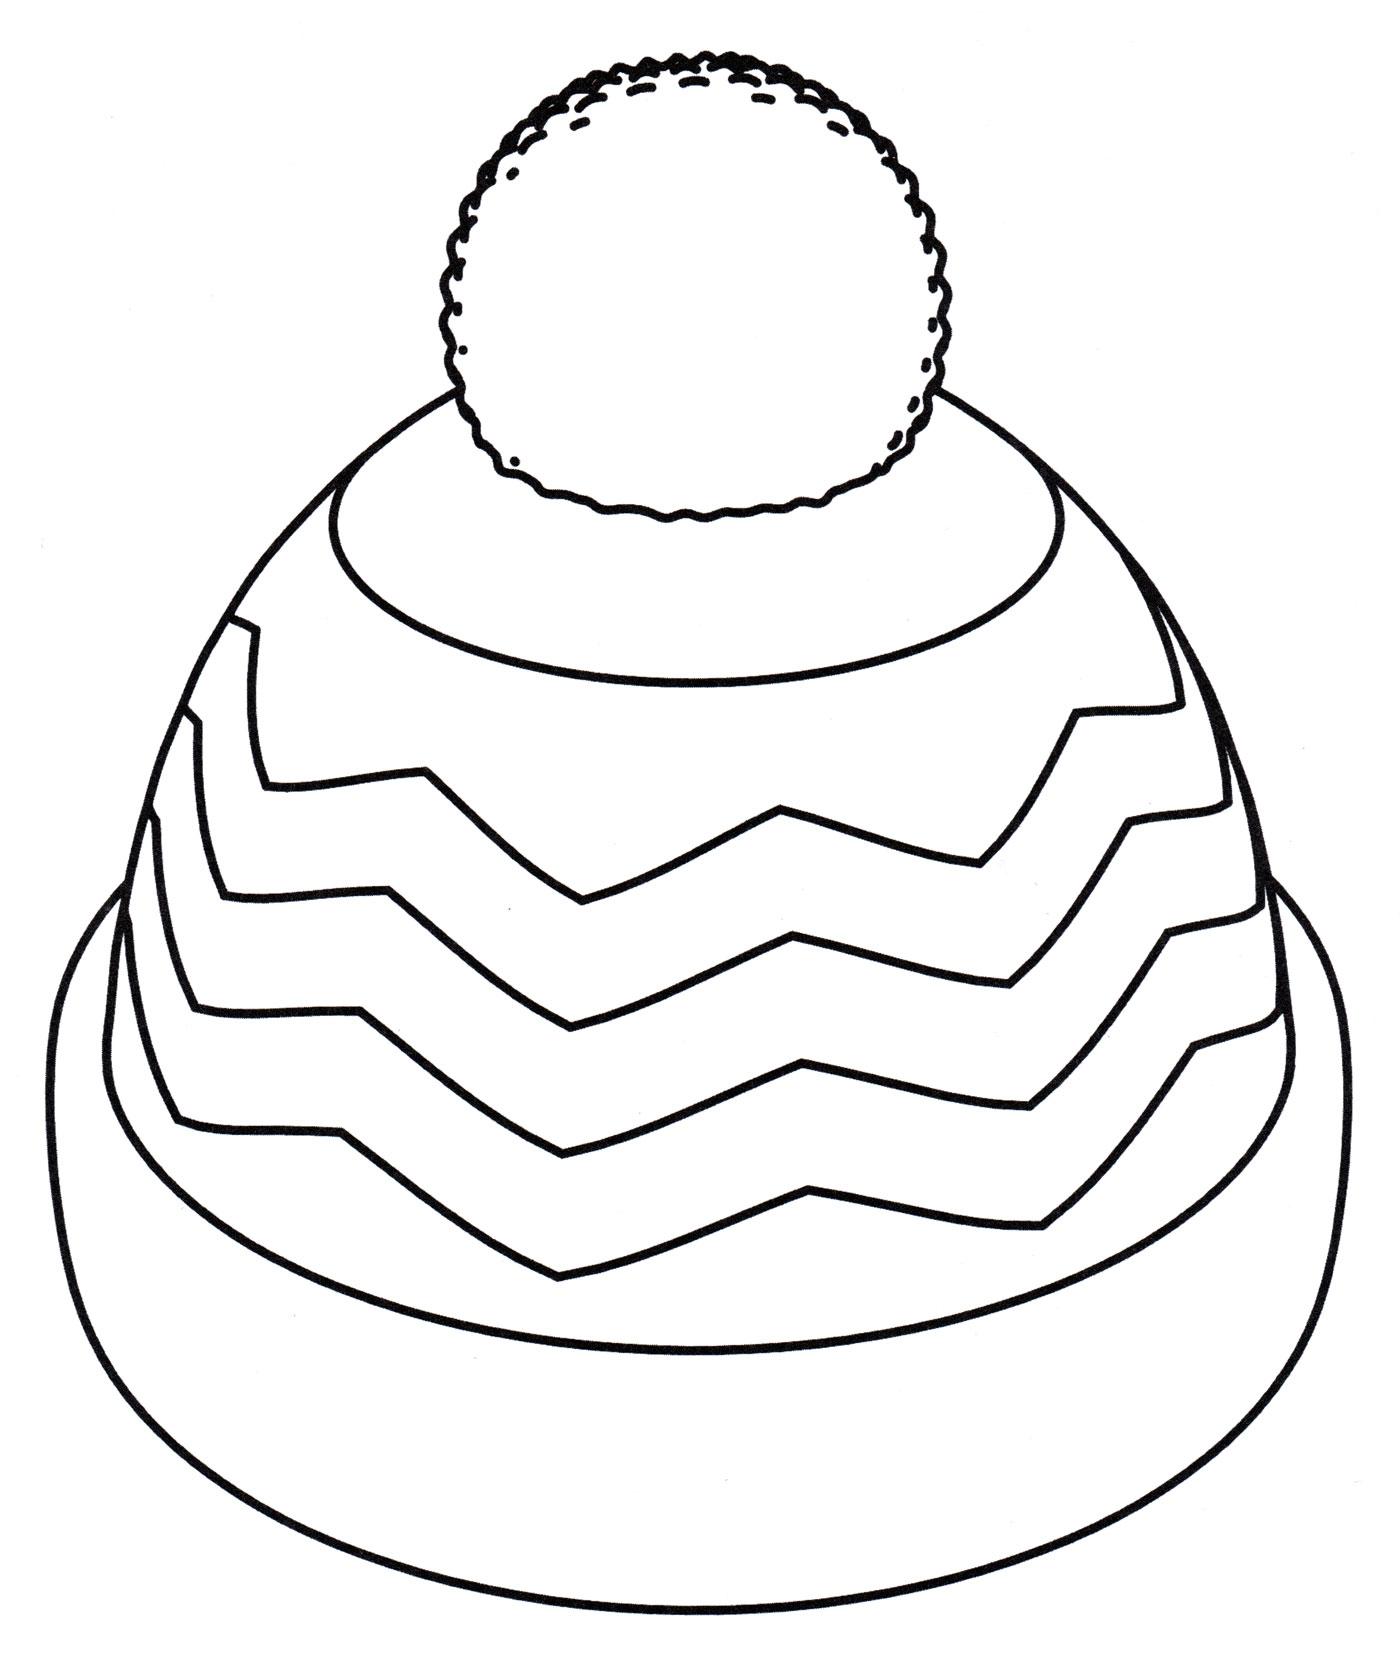 Раскраска Шапка с бубоном